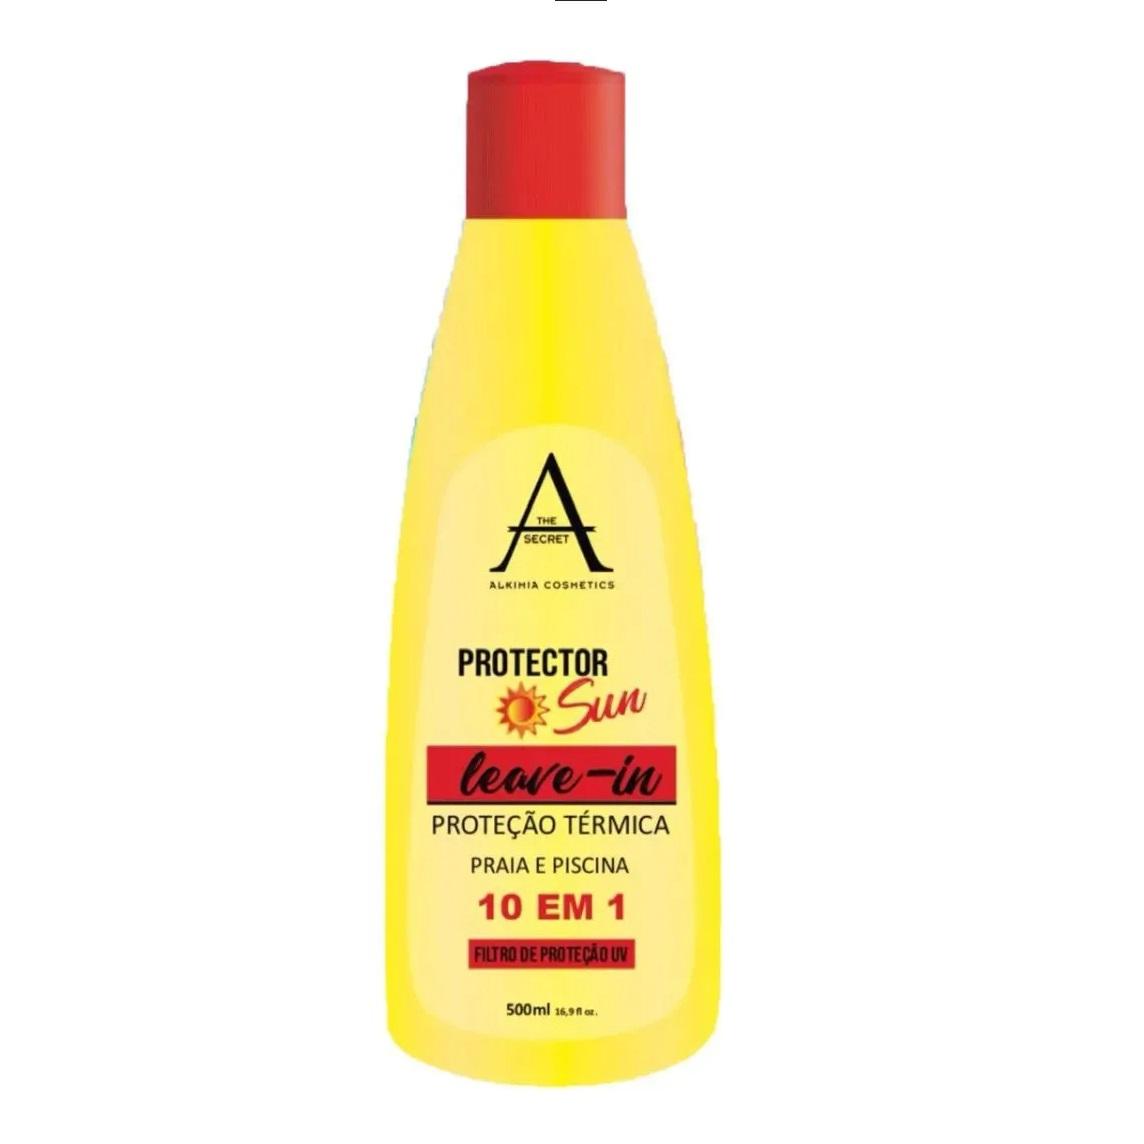 Leave-in Alkimia Cosmetics Protector Sun 500ml